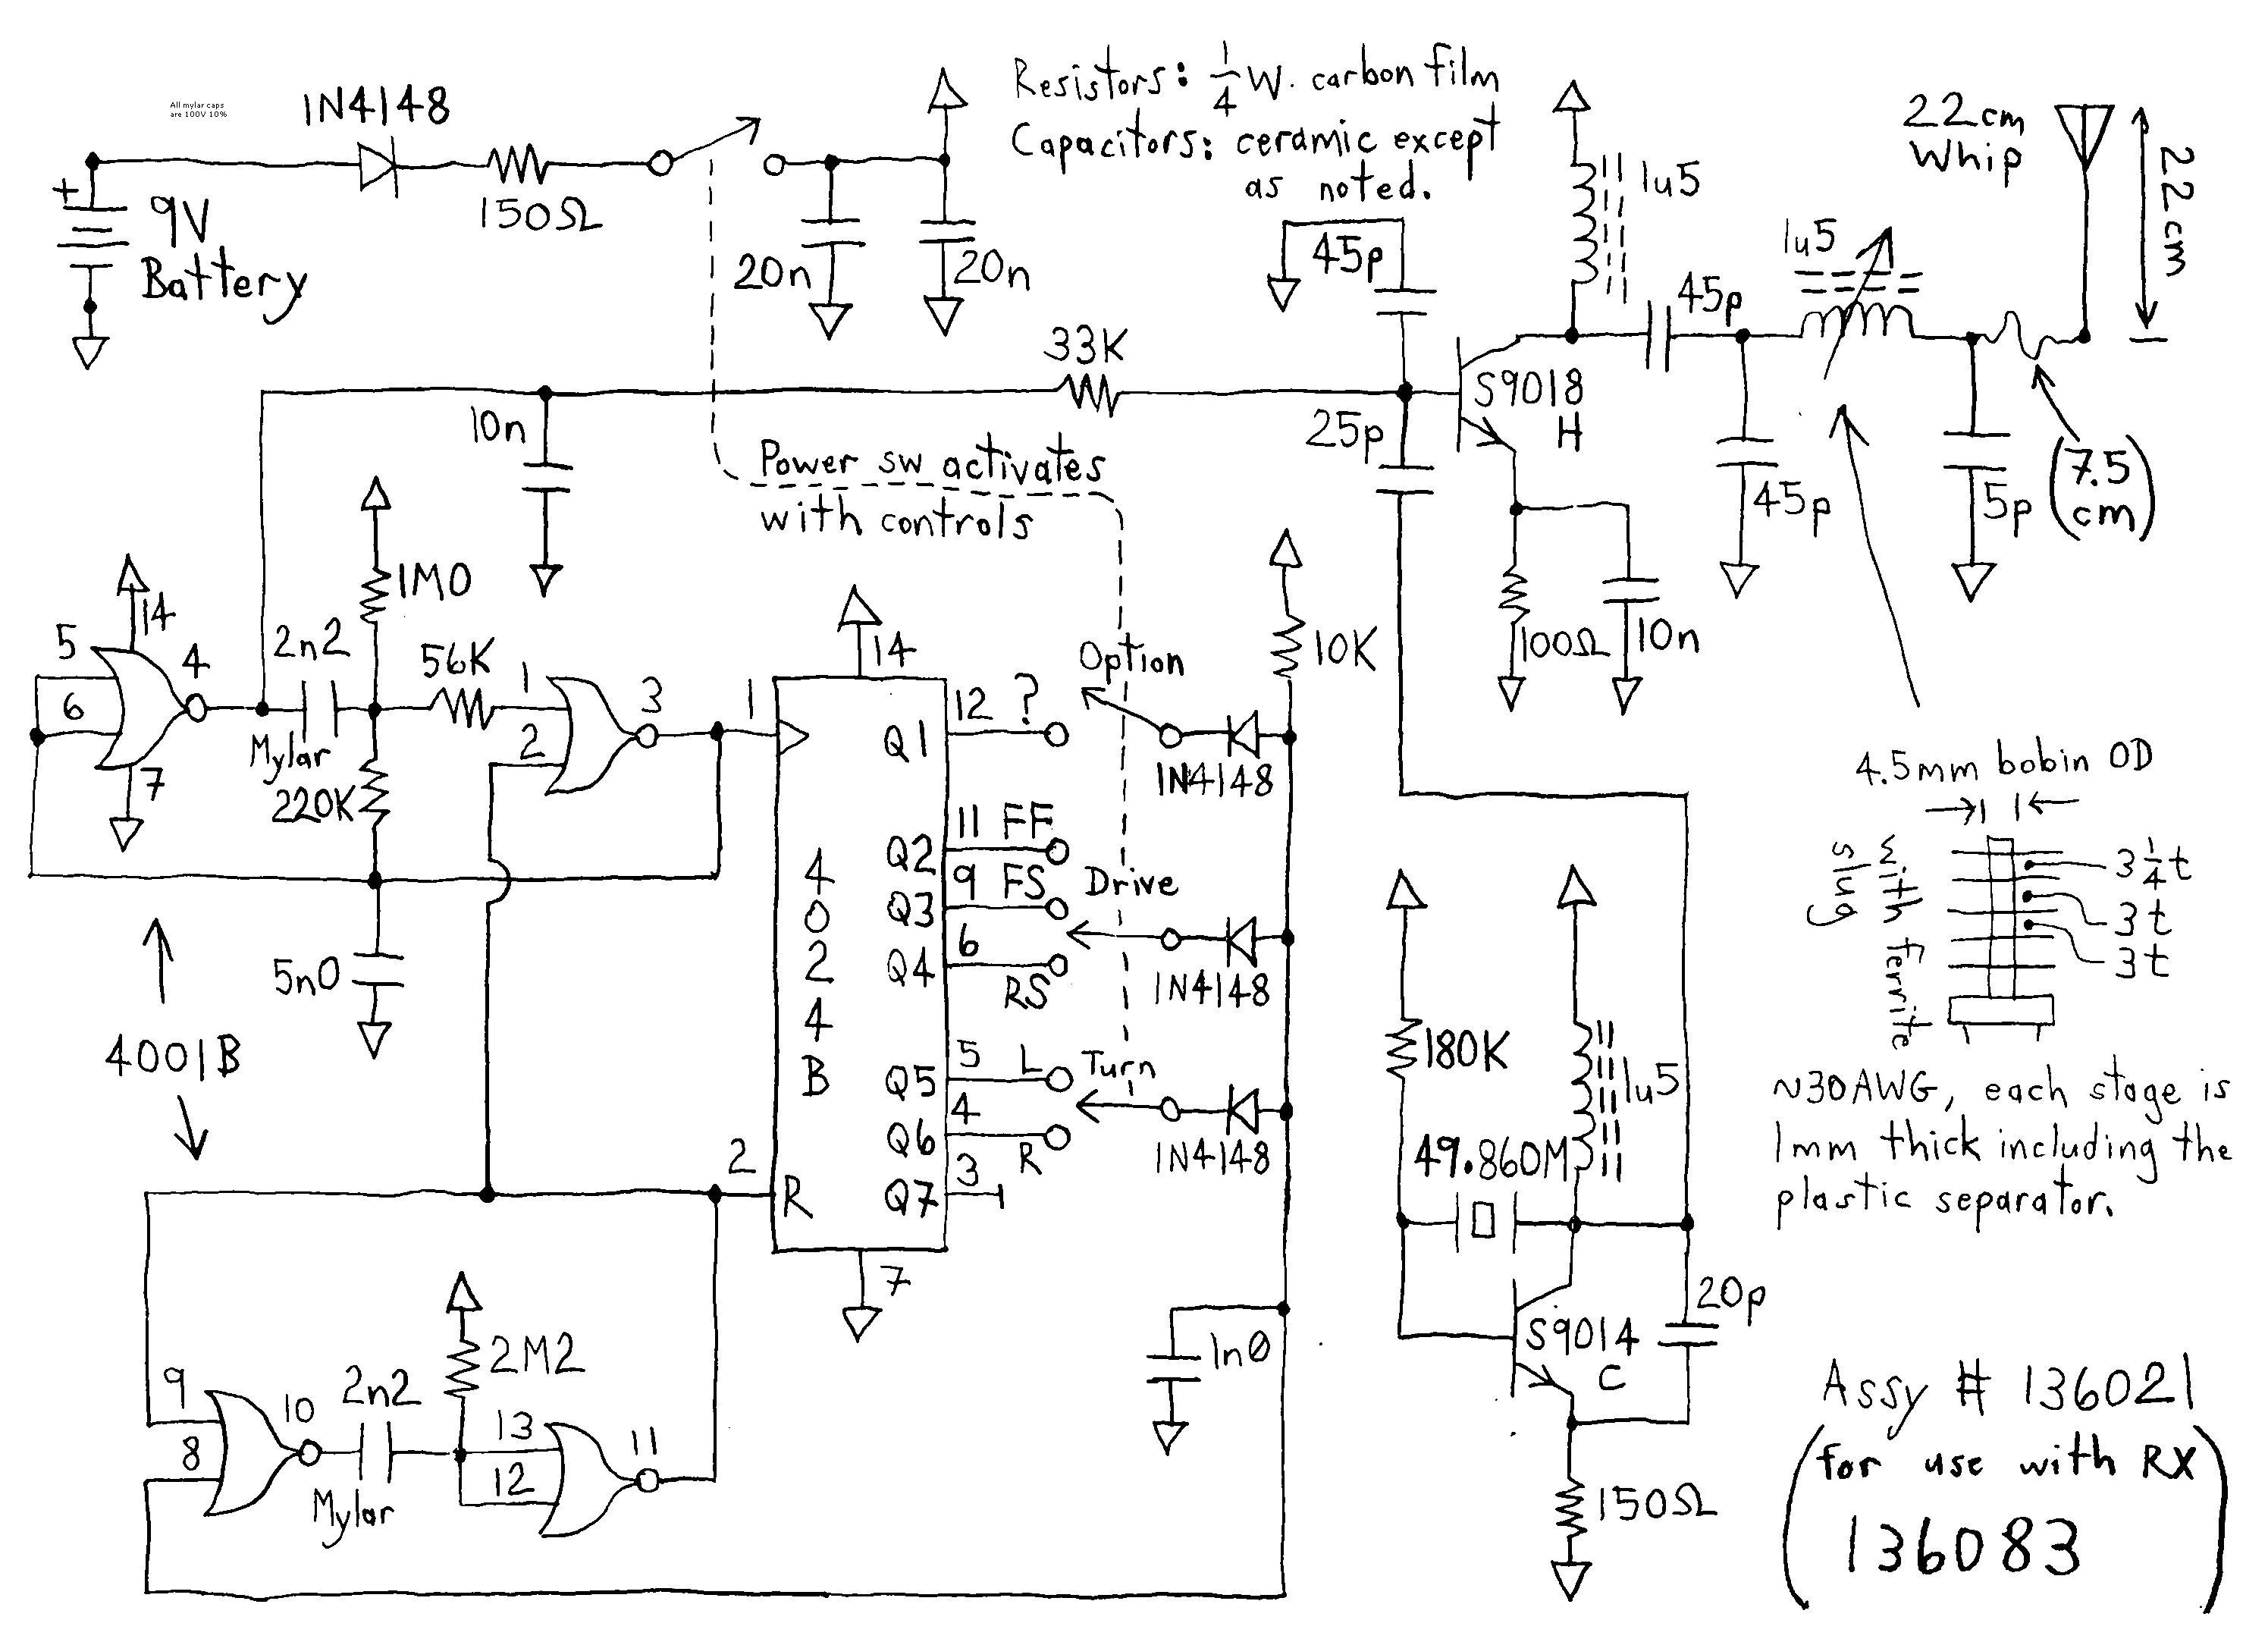 Car Electrical Wiring Diagrams Automotive Wiring Diagrams Basic Symbols New Automotive Wiring Of Car Electrical Wiring Diagrams